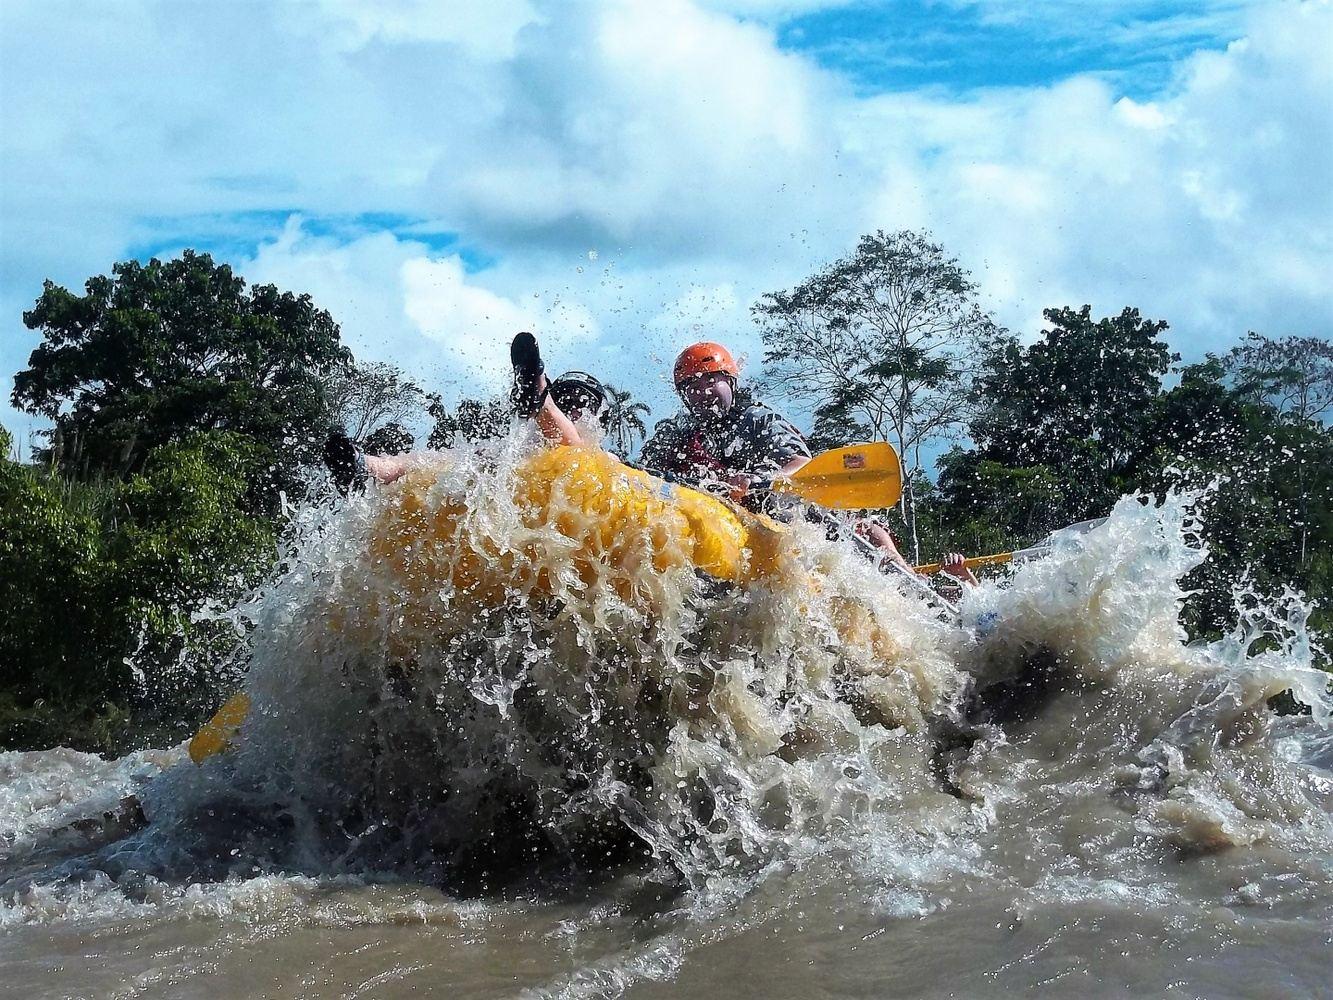 Rafting Jatunyacu River (Upper Napo)